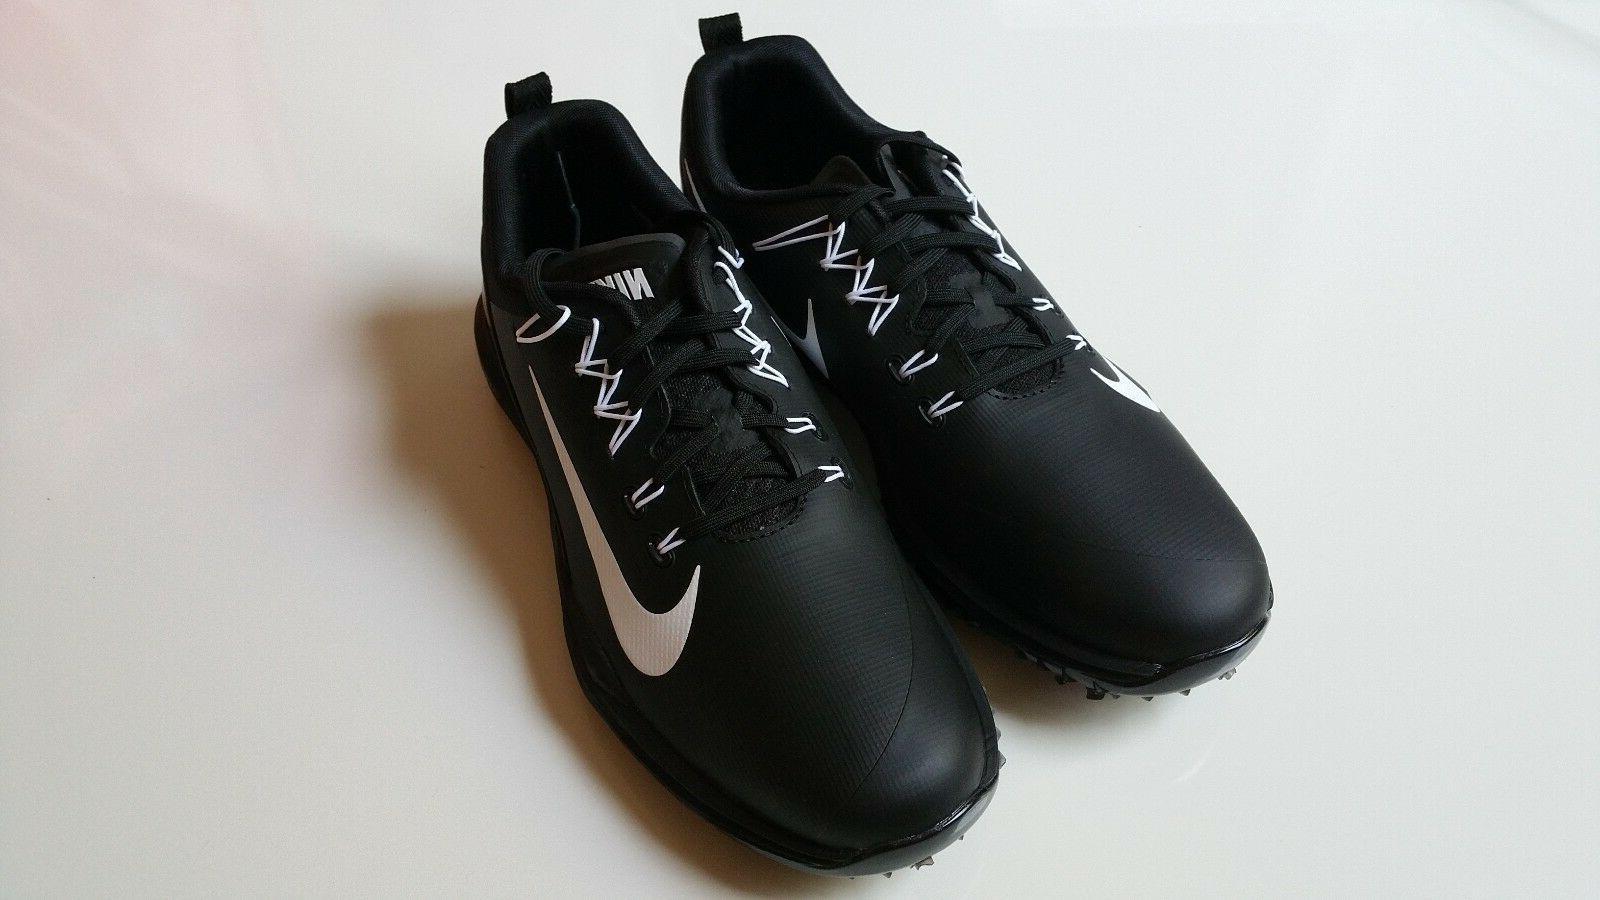 new lunar command 2 golf shoes black